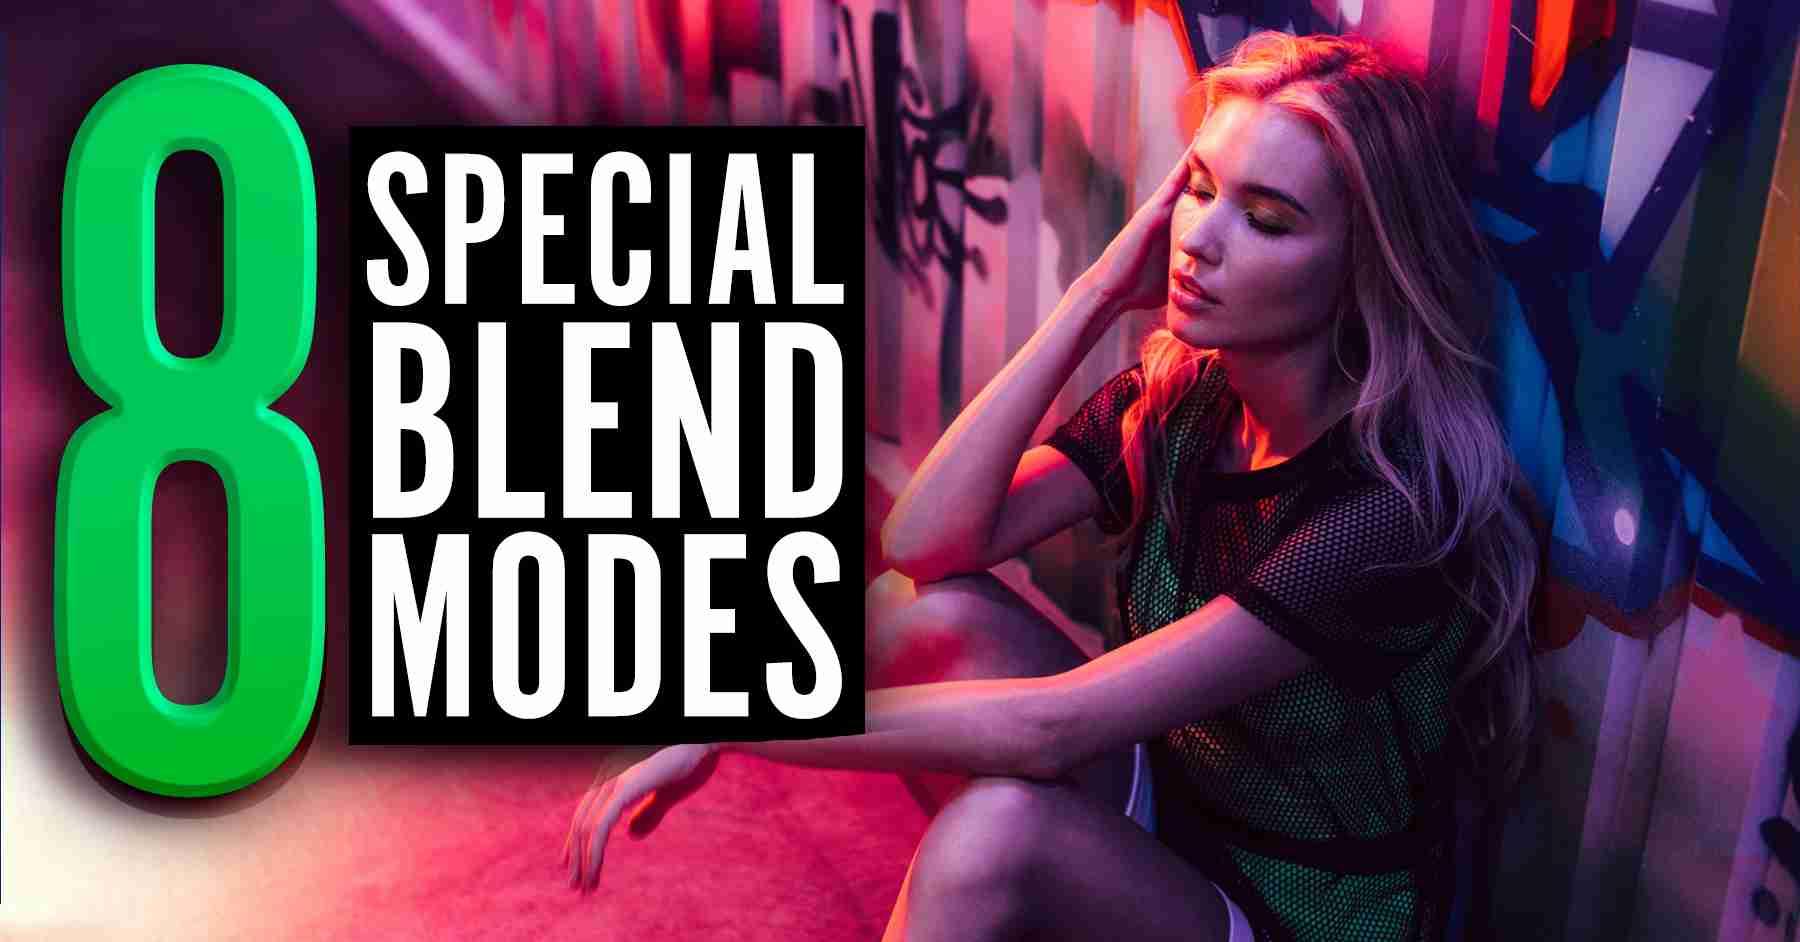 8 Special Blending Modes